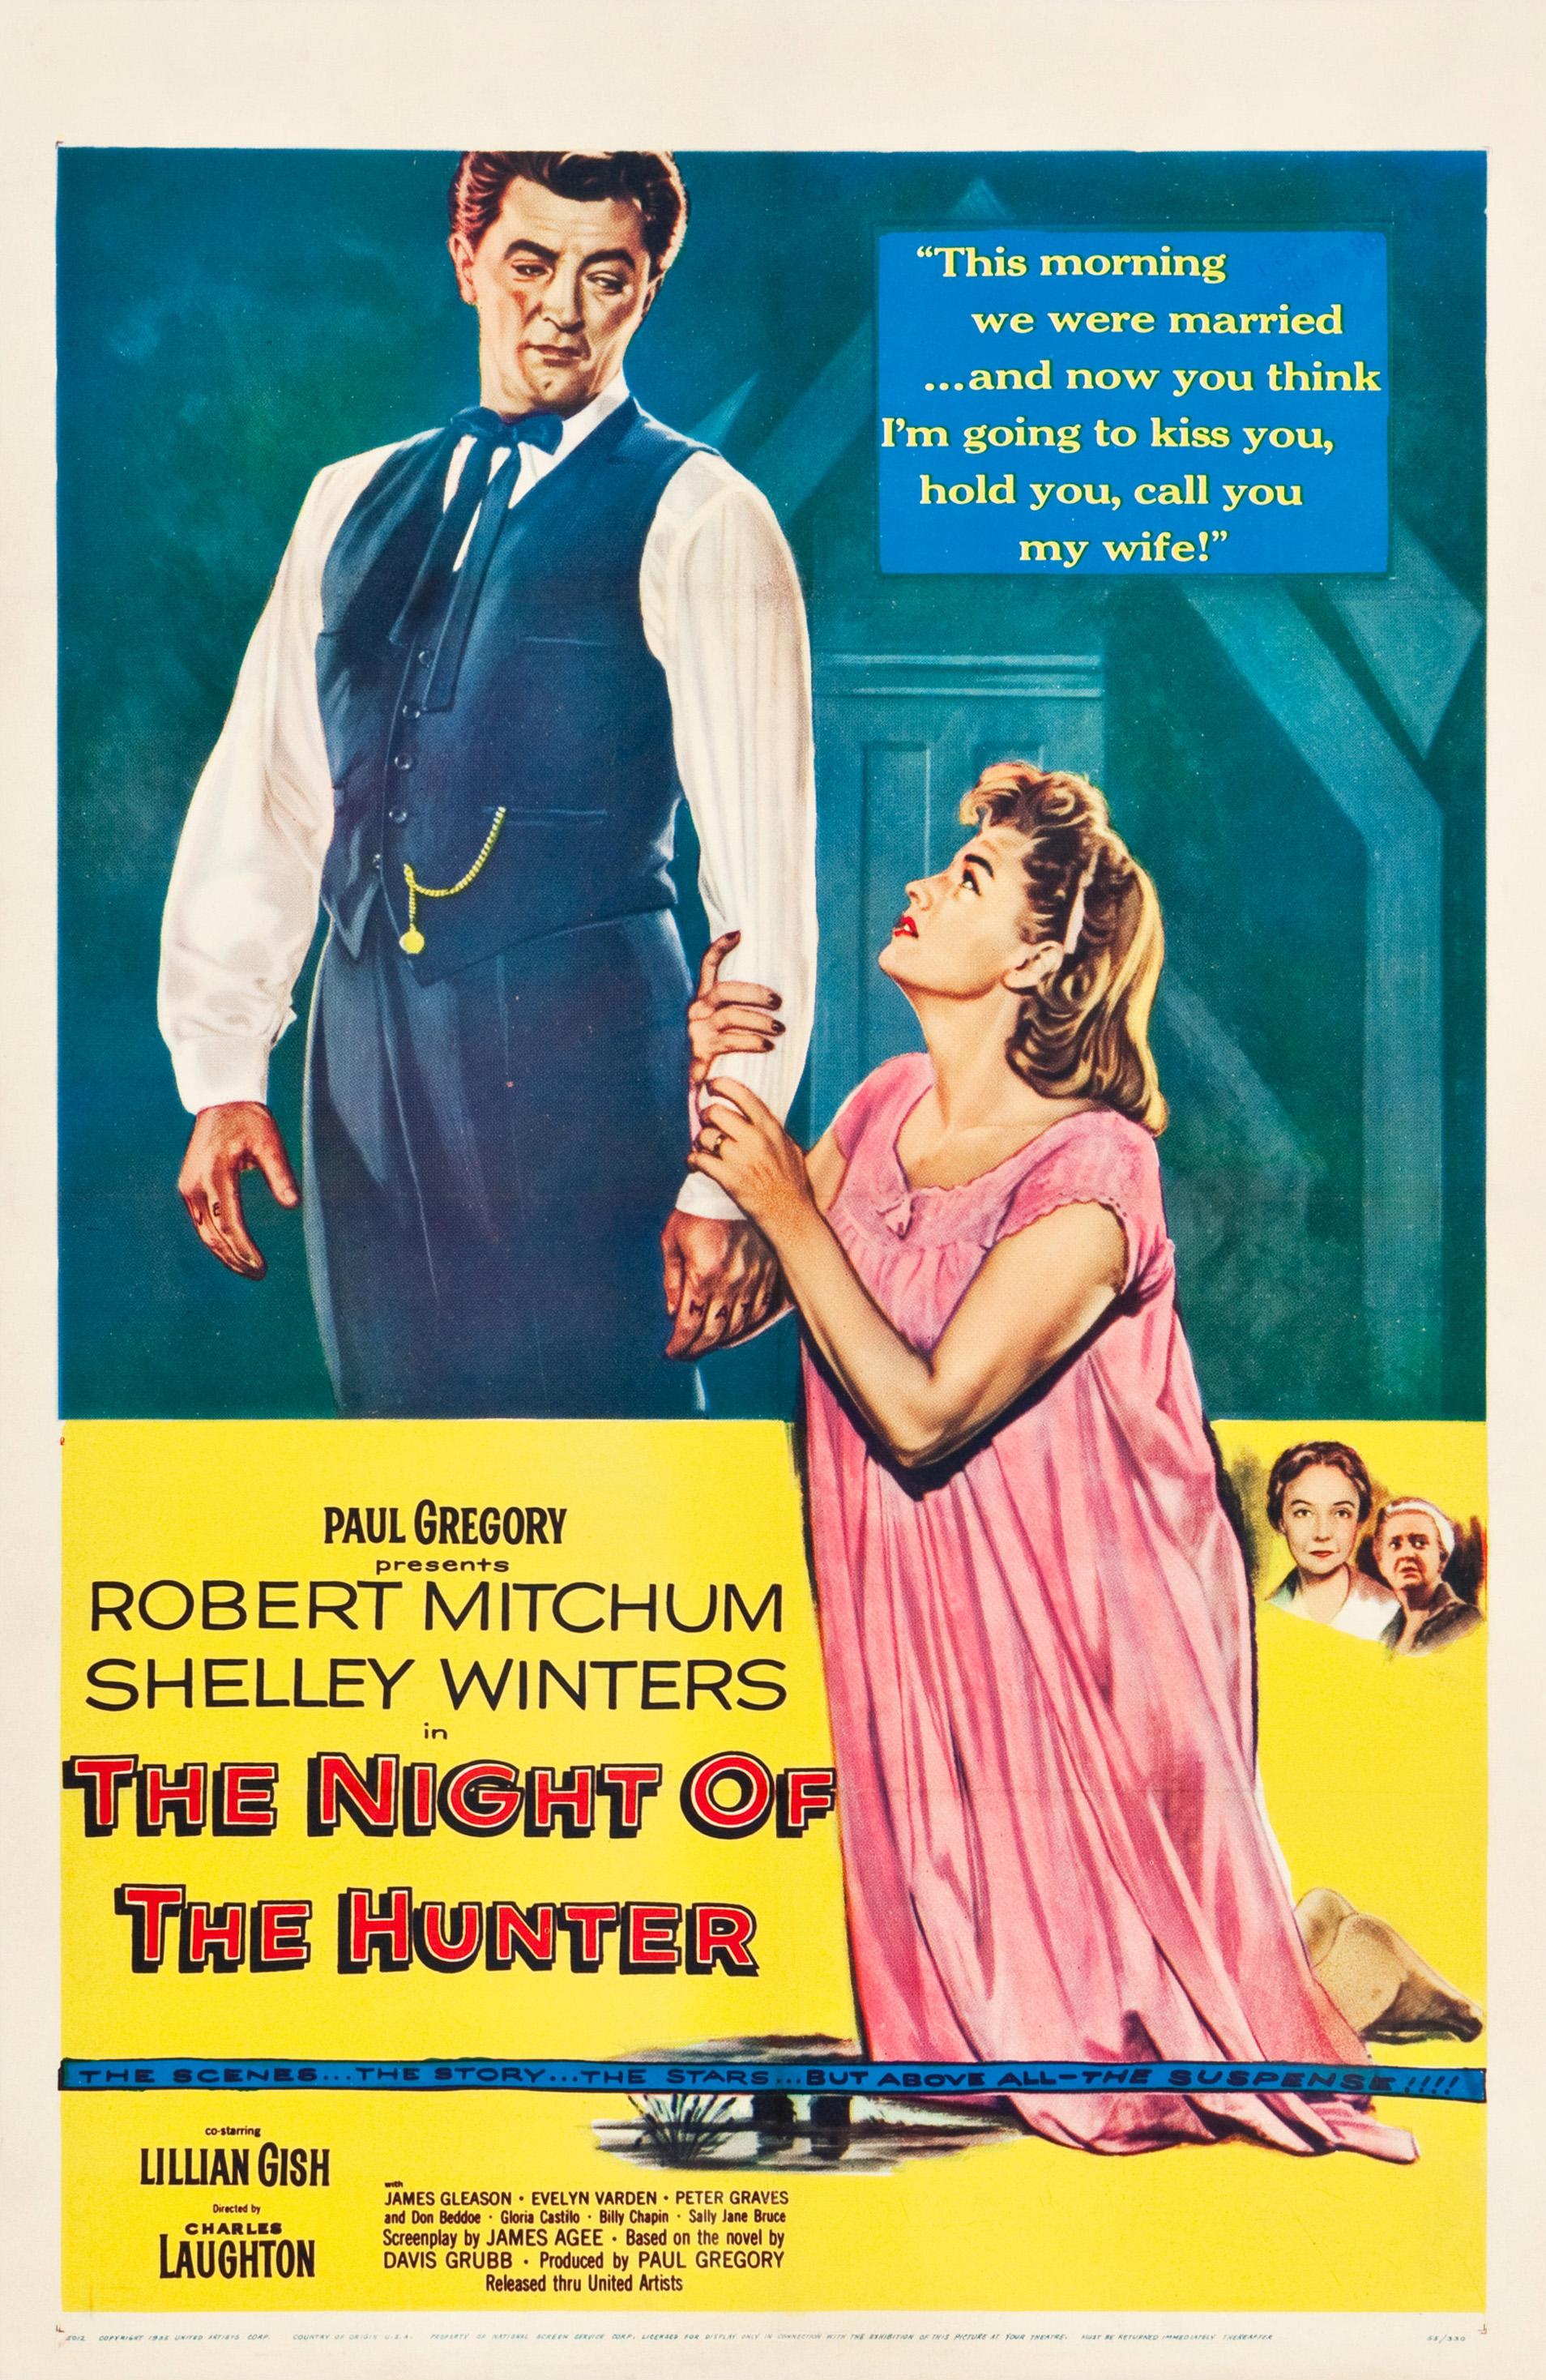 The Big steal Robert Mitchum vintage movie poster print